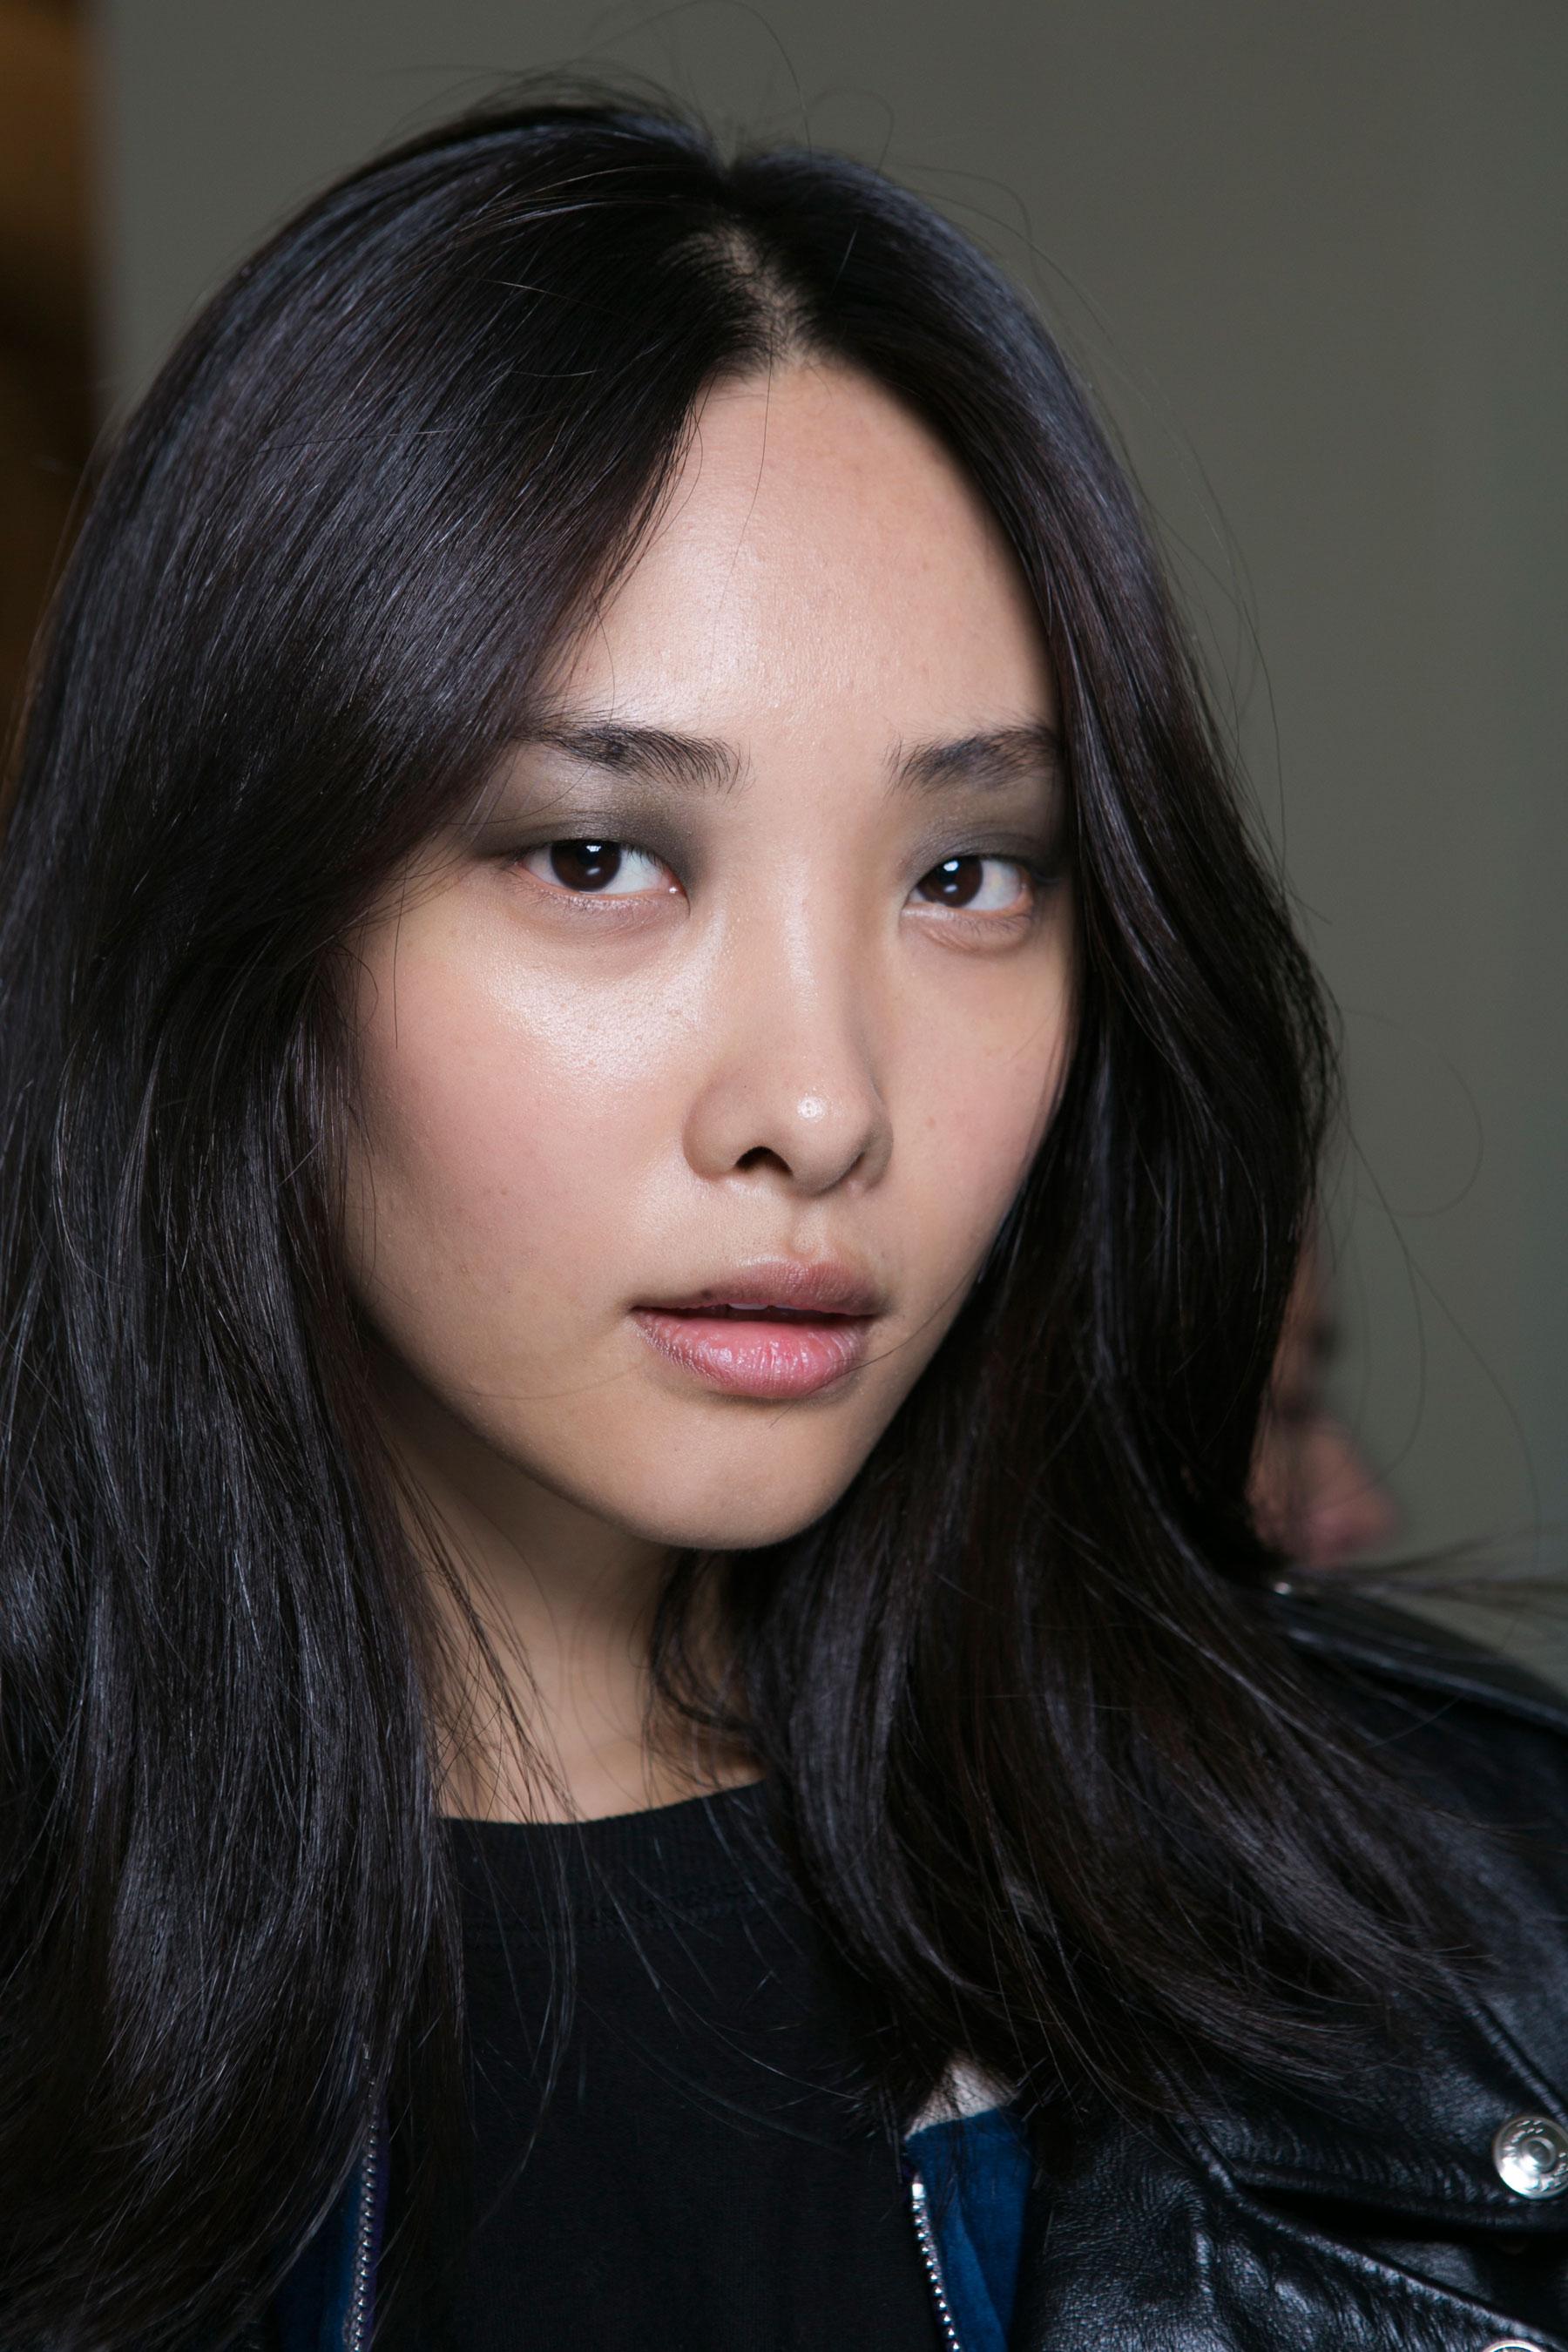 Barbara-Bui-spring-2016-beauty-fashion-show-the-impression-01